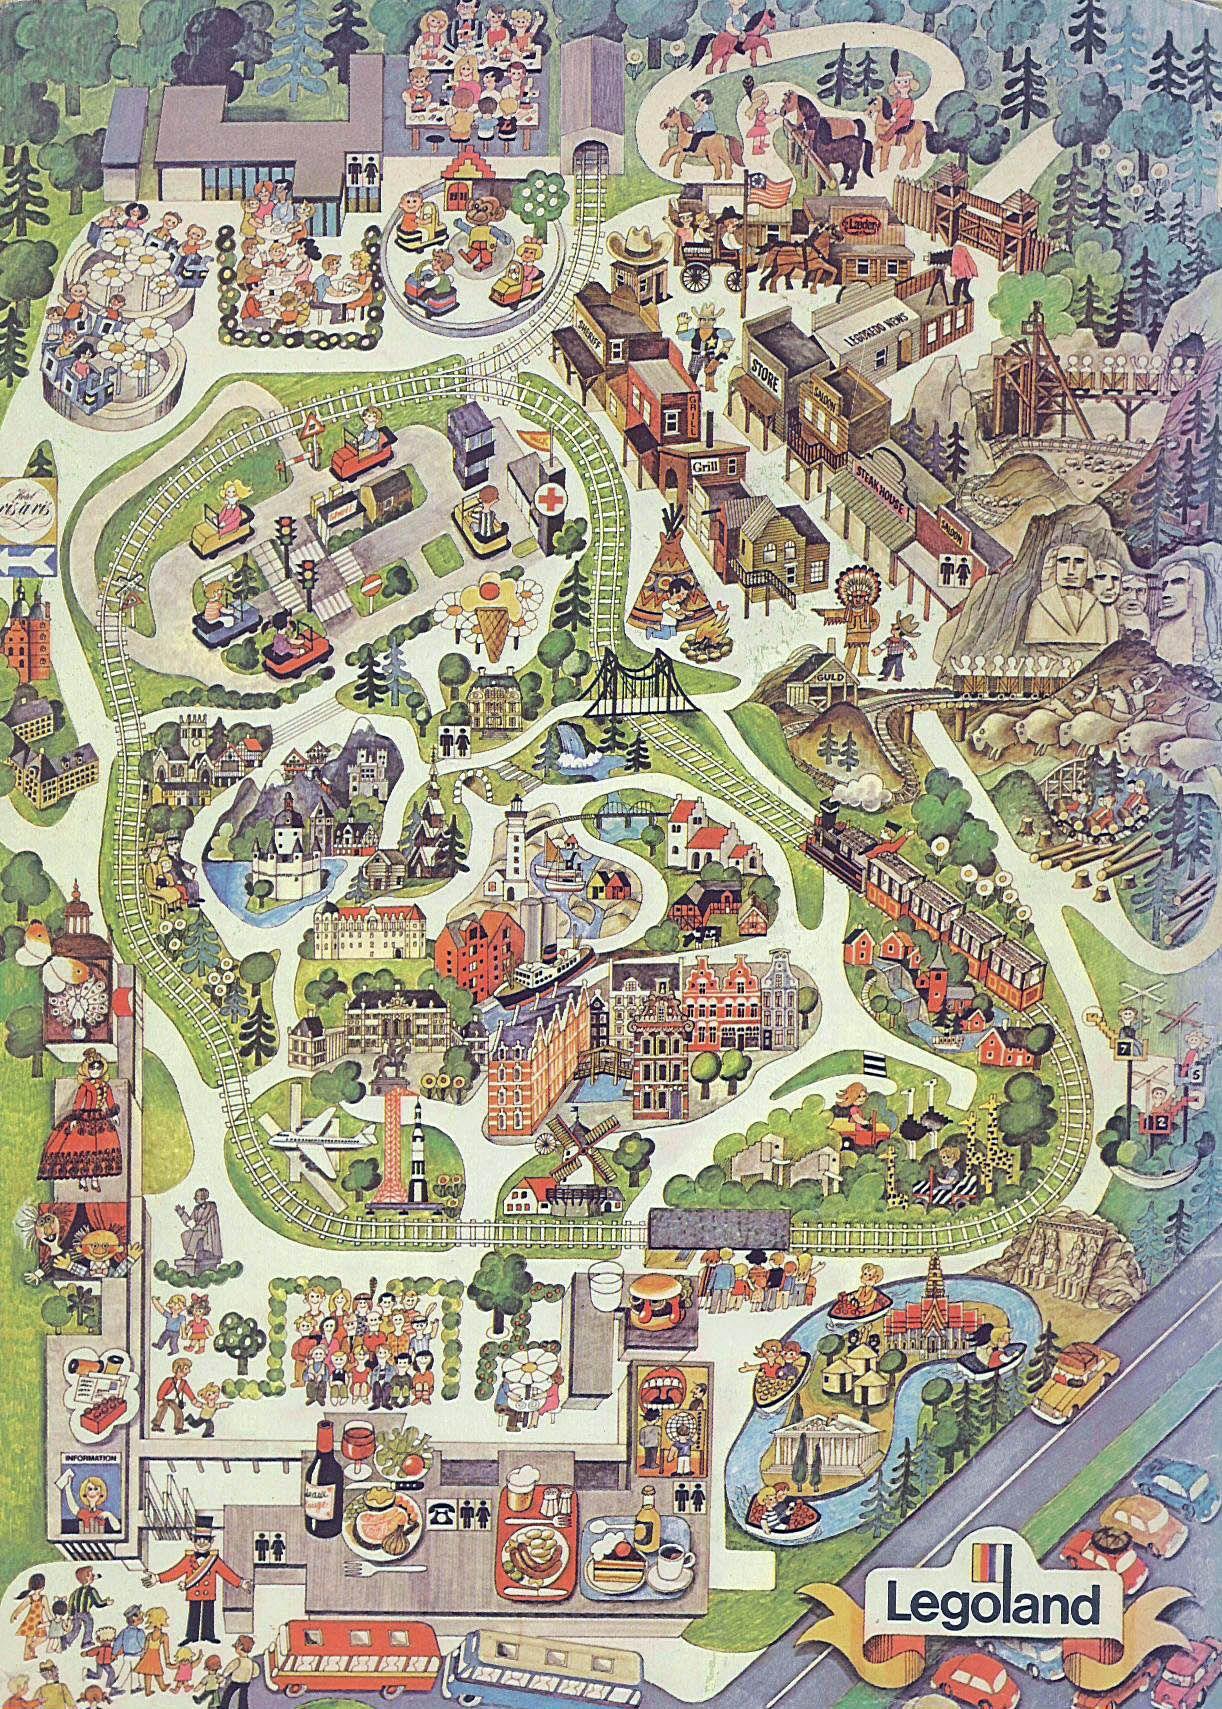 Legoland (1980) in 2020 | Fantasy map, Map art, Legoland